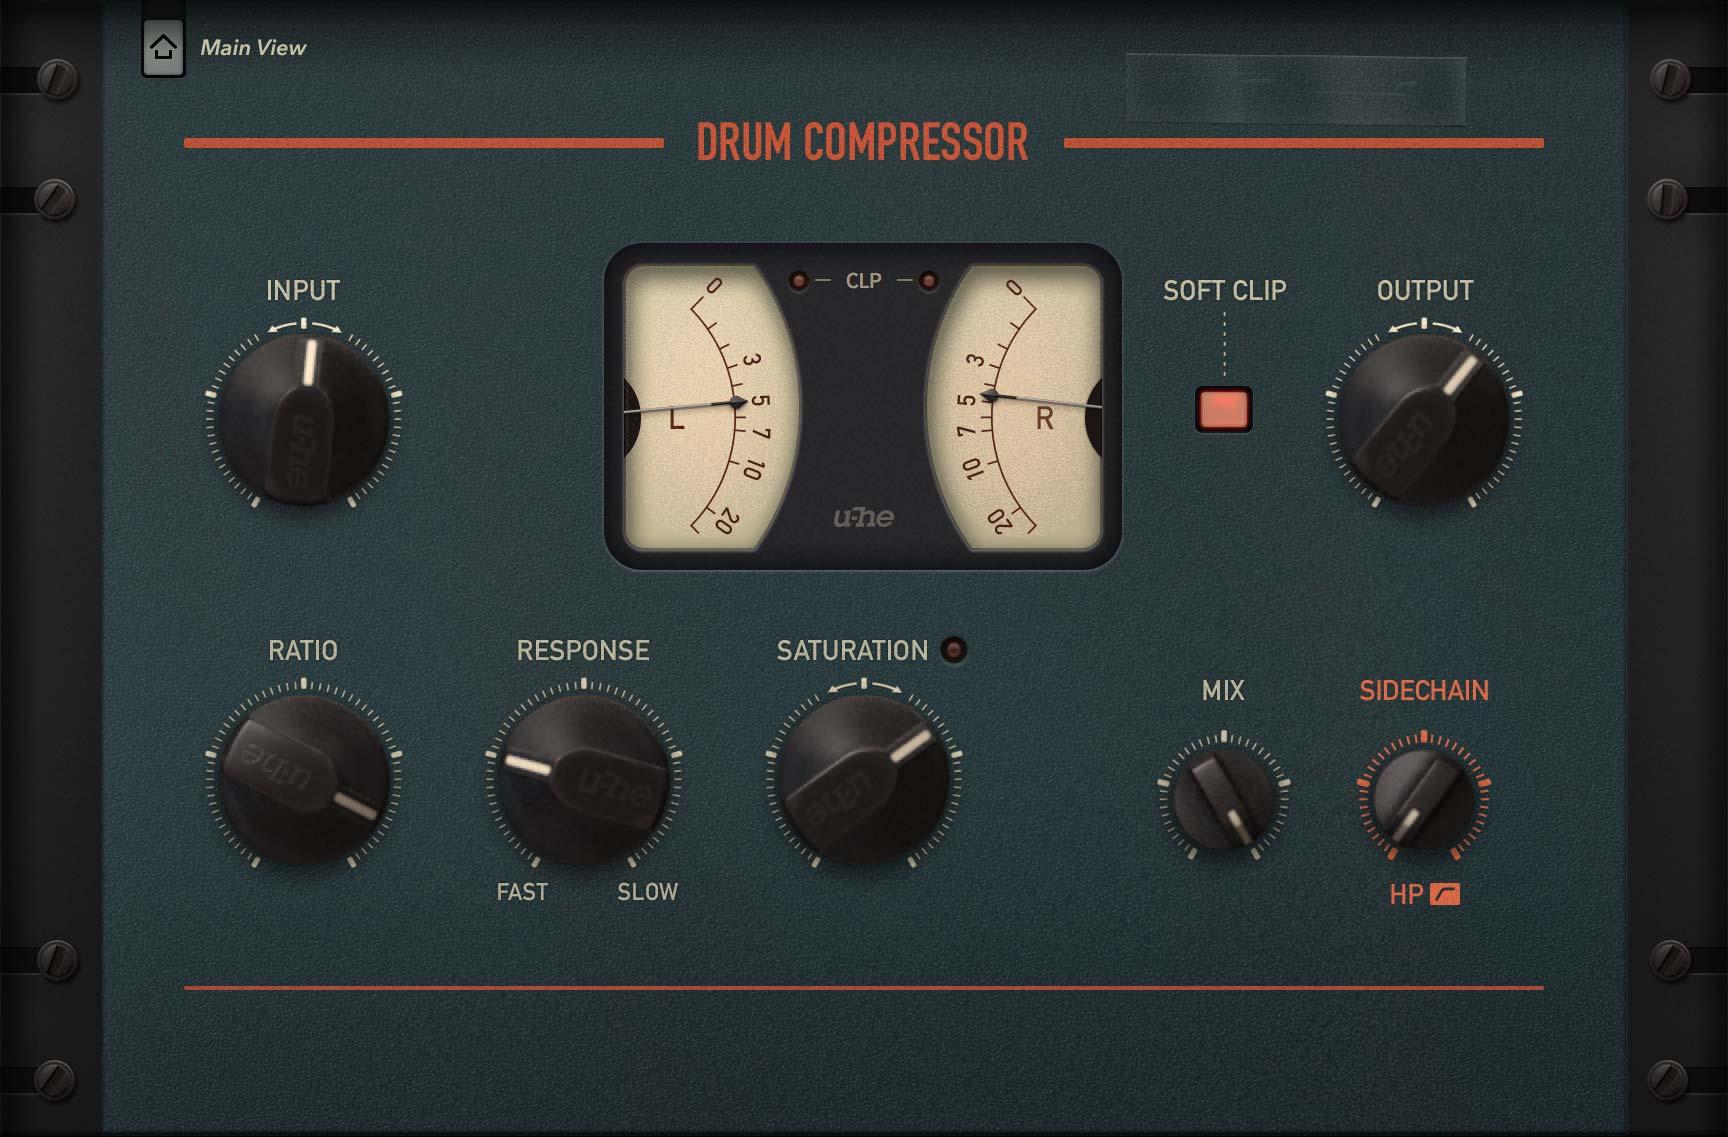 Drum Compressor